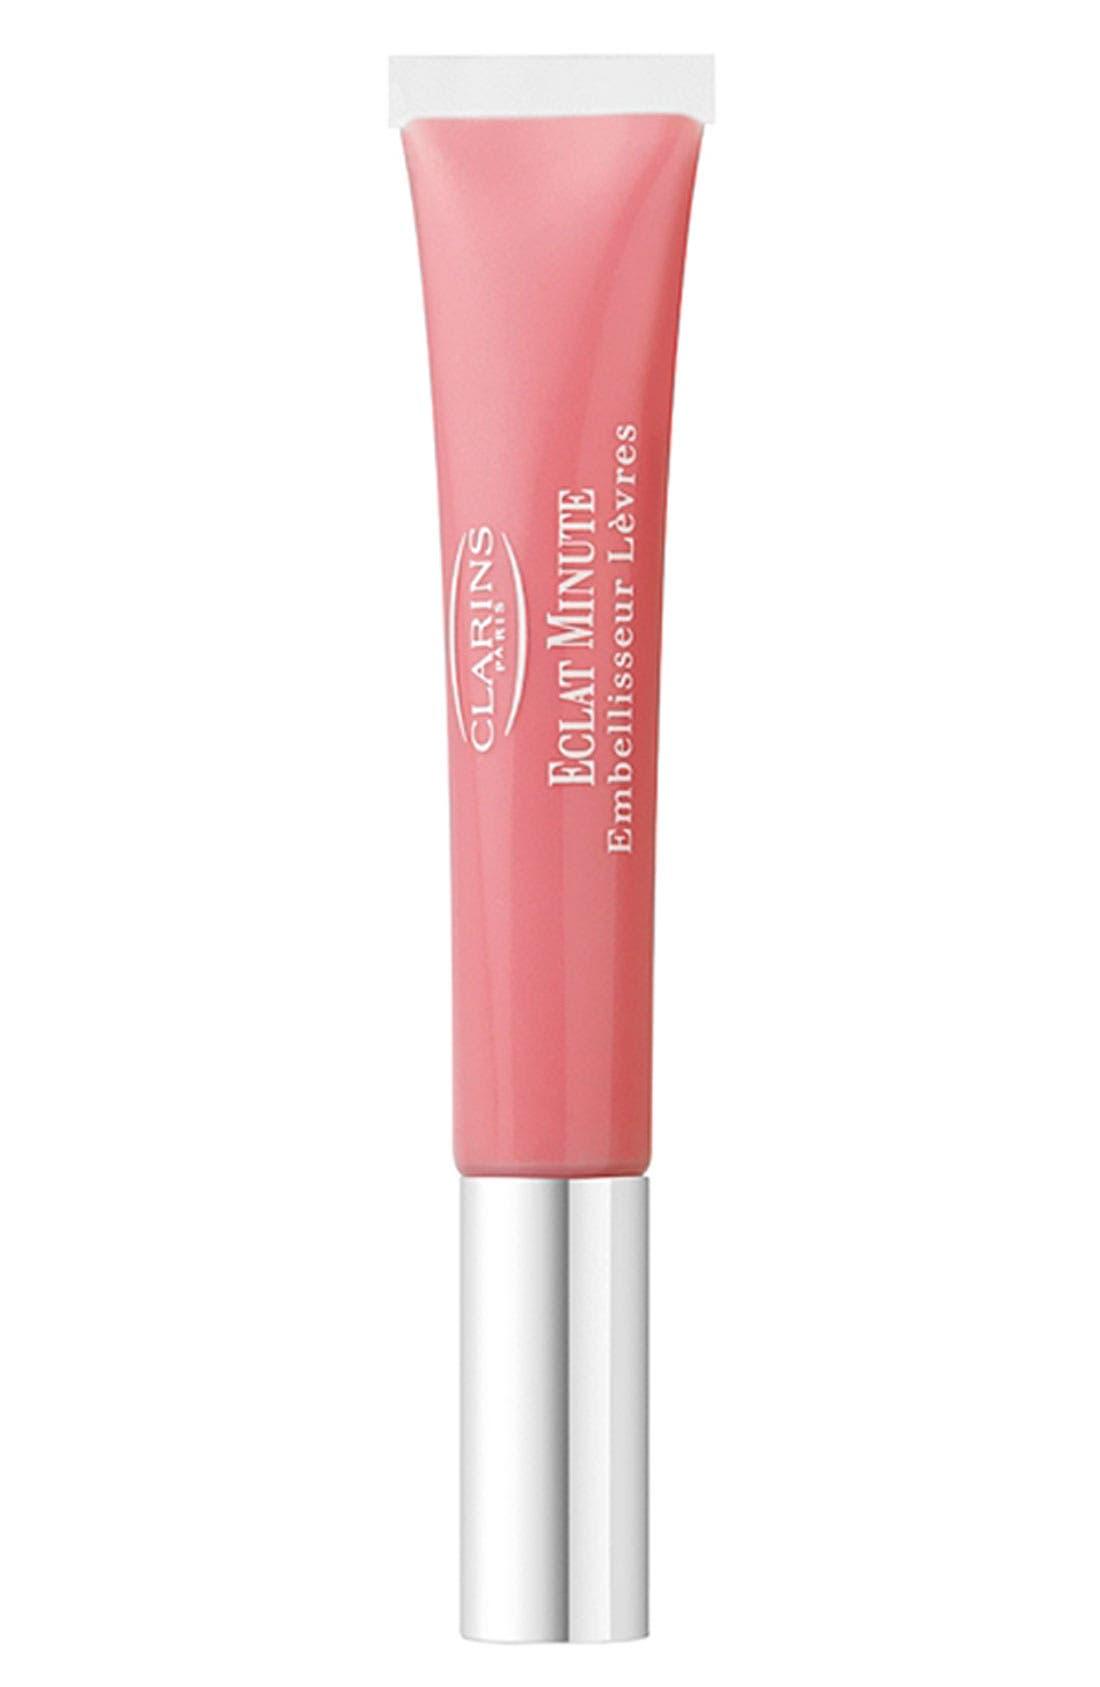 'Instant Light' Natural Lip Perfector,                             Main thumbnail 1, color,                             001